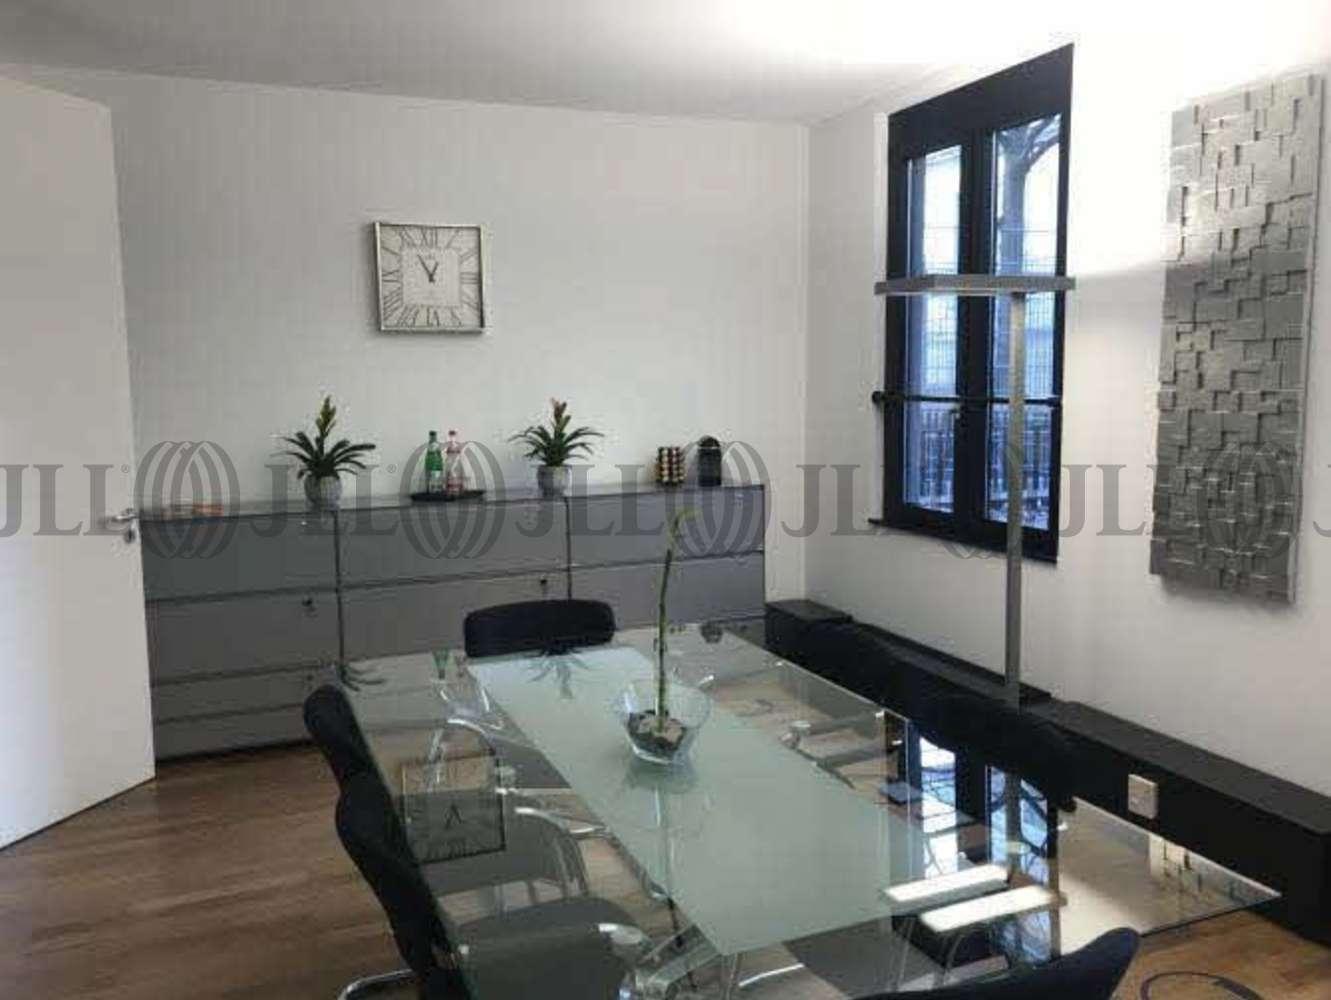 Büros Frankfurt am main, 60329 - Büro - Frankfurt am Main, Bahnhofsviertel - F0050 - 10890320